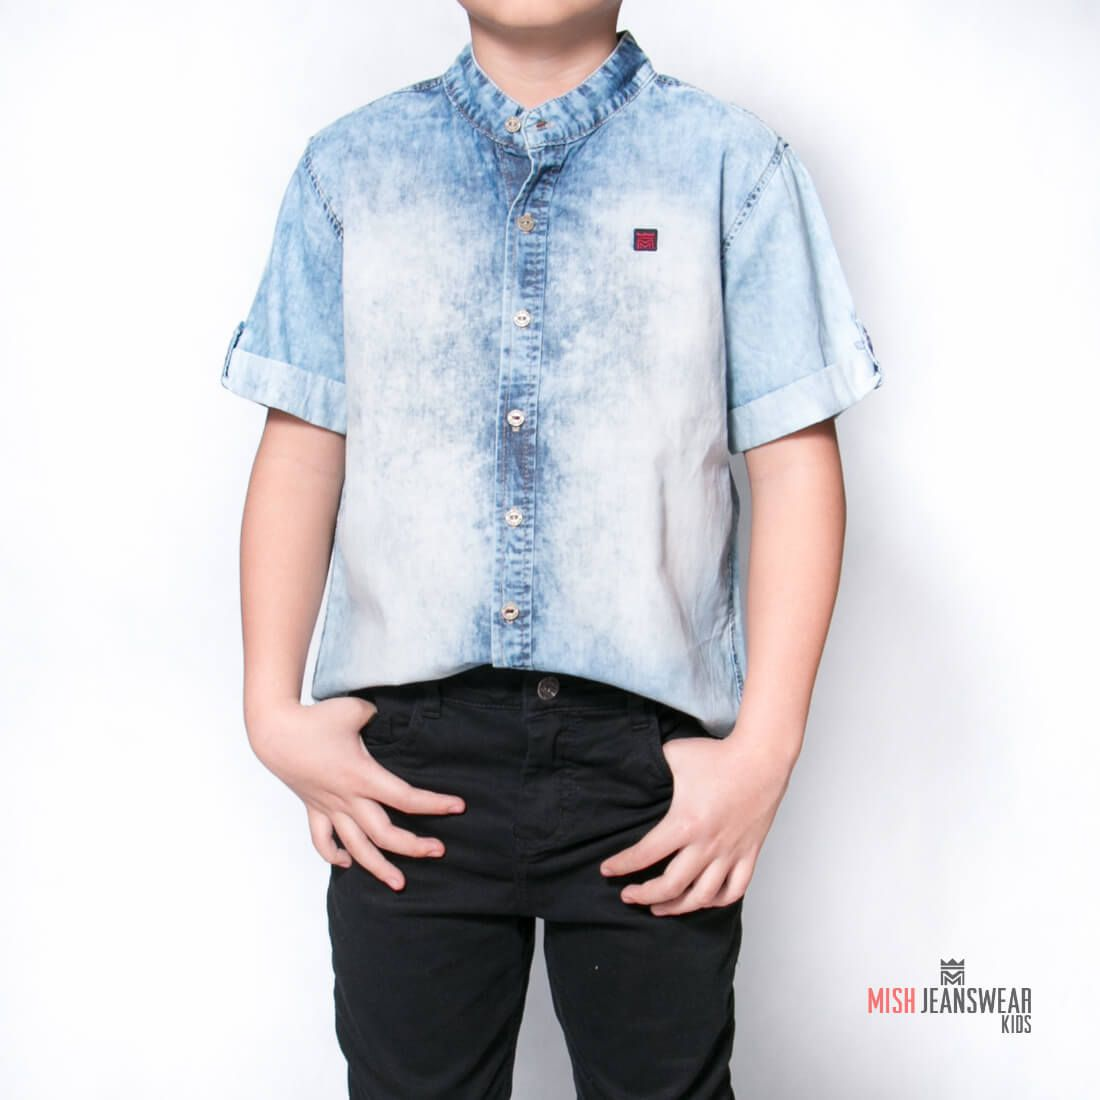 5712aa928a1a1 Camisa jeans infantil gola padre Mish masculina